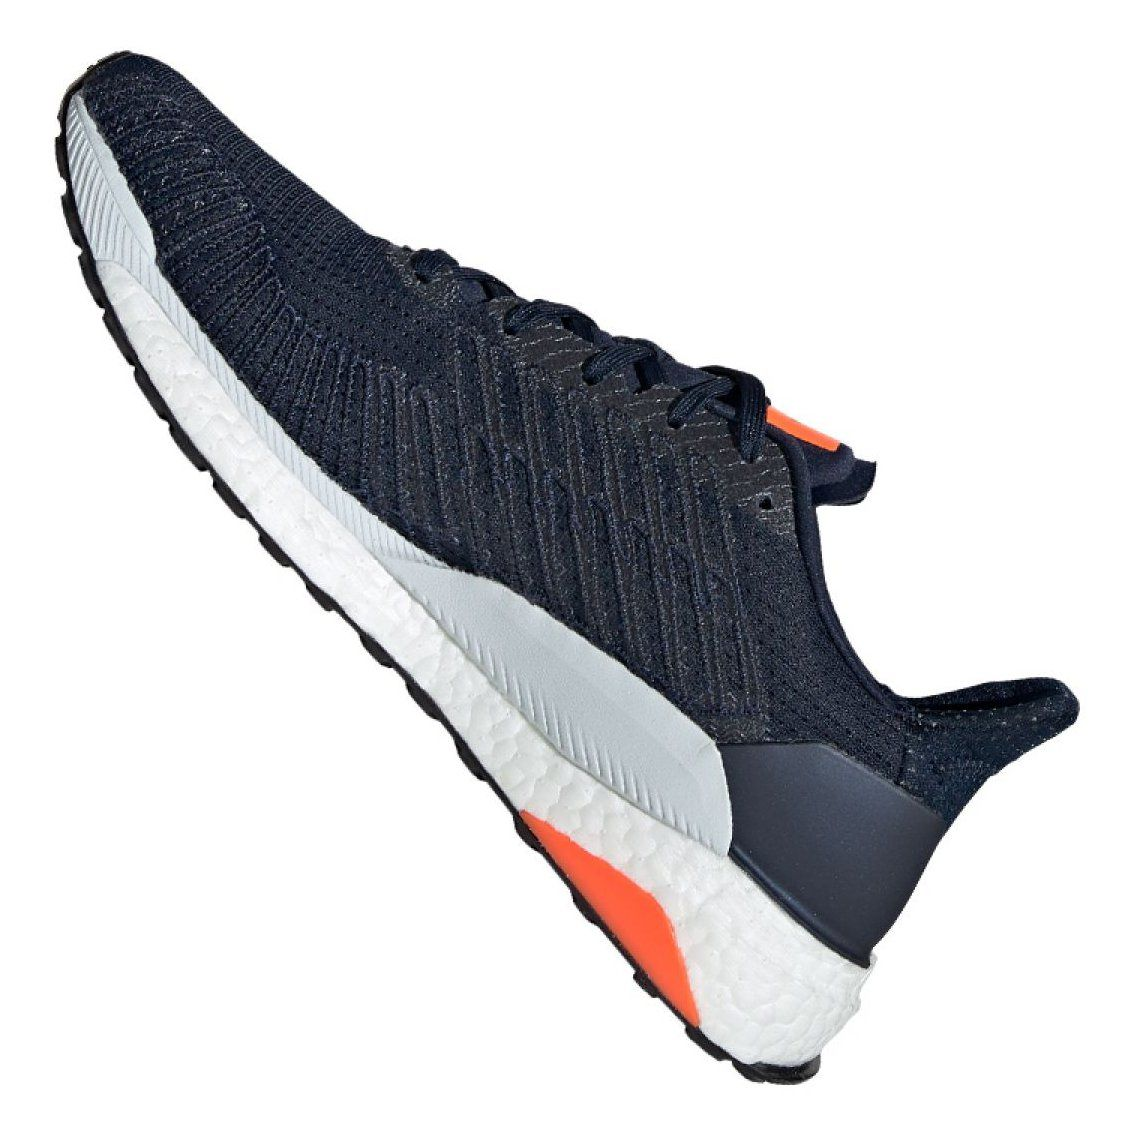 Wielokolorowe Buty biegowe adidas Solar Boost 19 M G28059